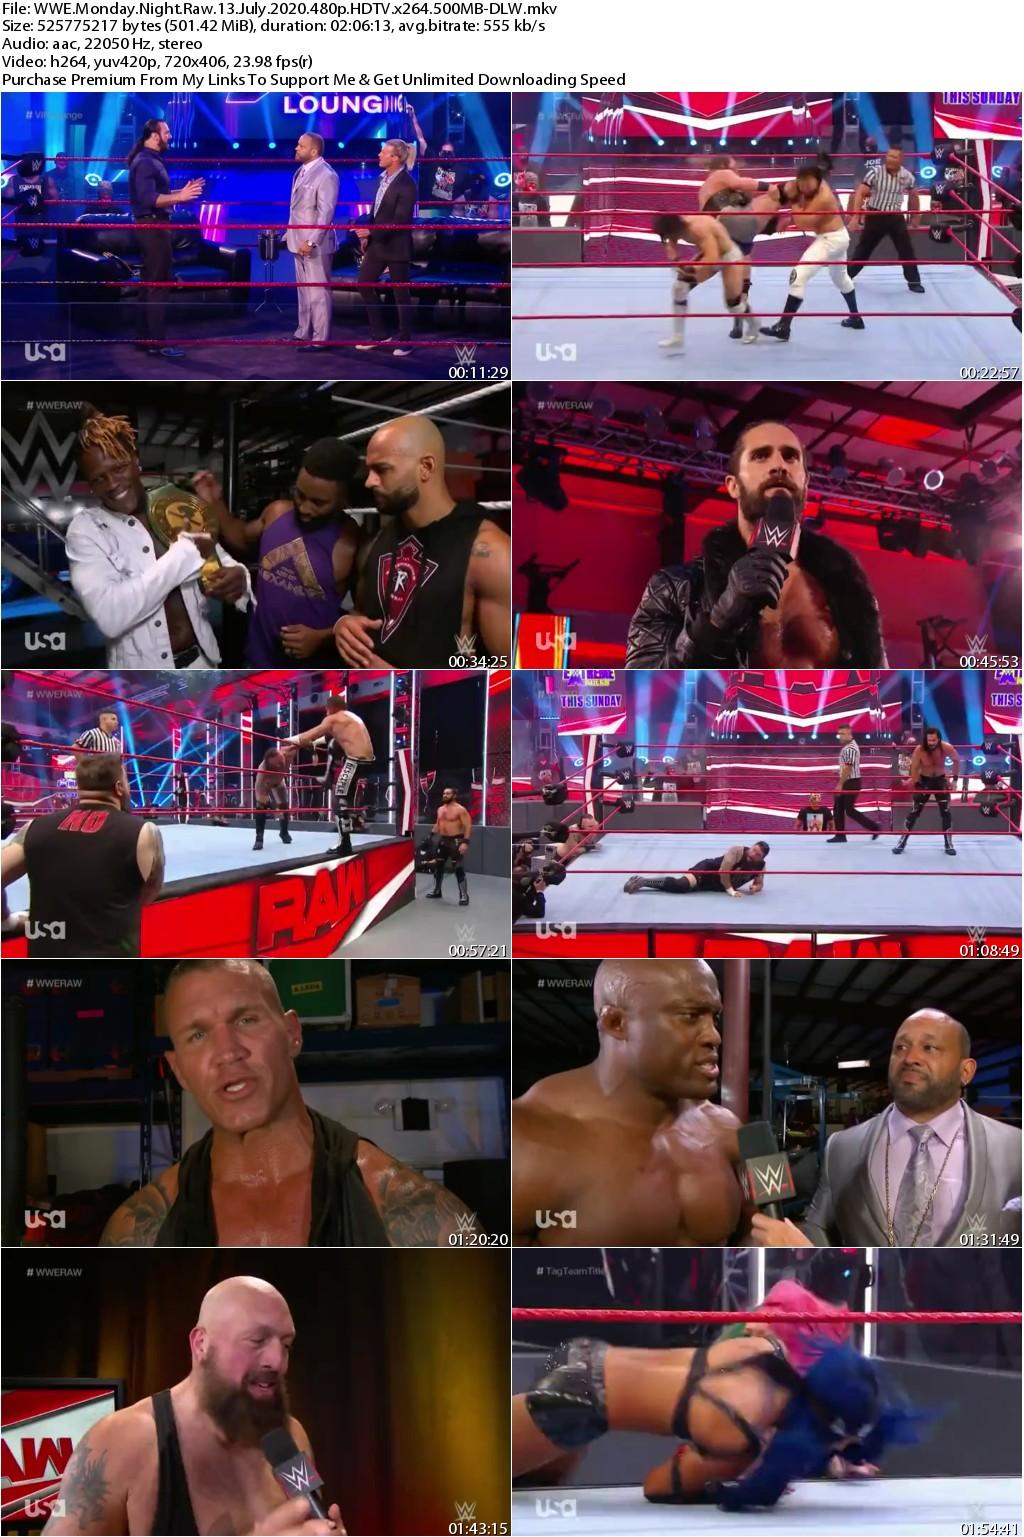 WWE Monday Night Raw 13 July 2020 480p HDTV x264 500MB-DLW